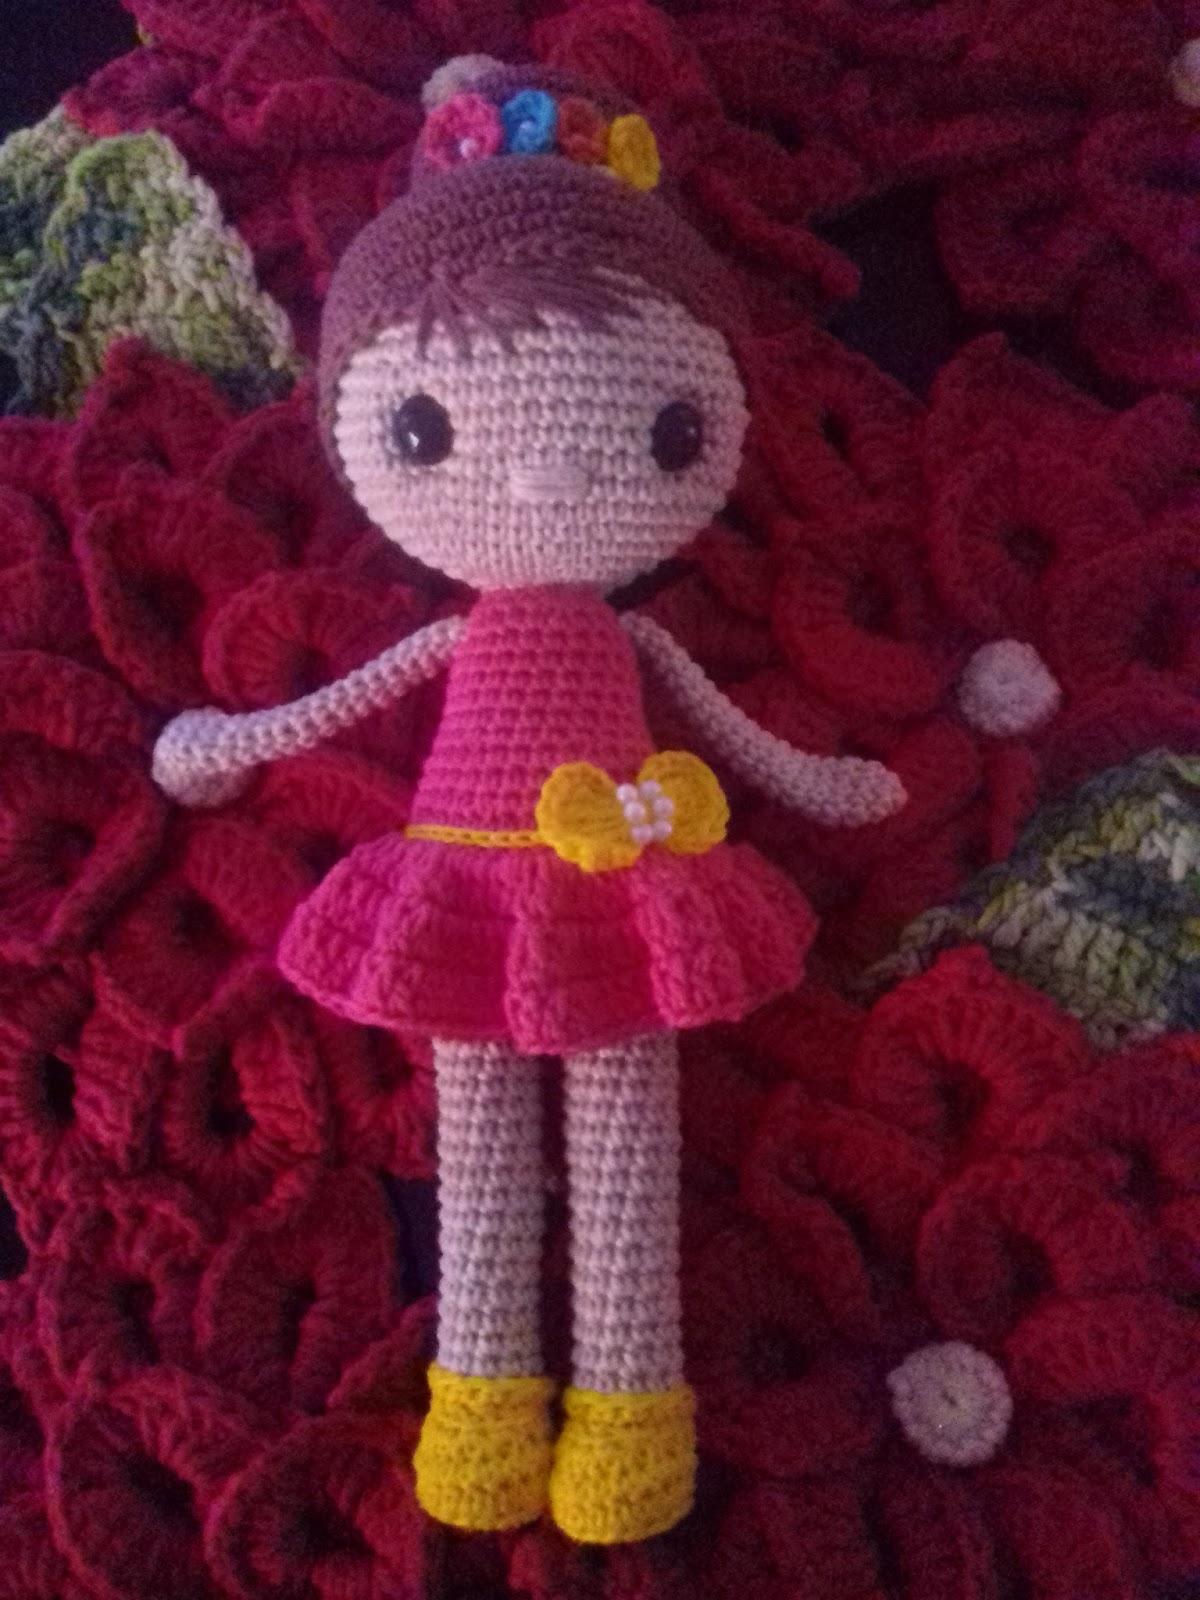 10 Amigurumi Turquia FREE Crochet Patterns 2020 - Casa - Nc to do | 1600x1200